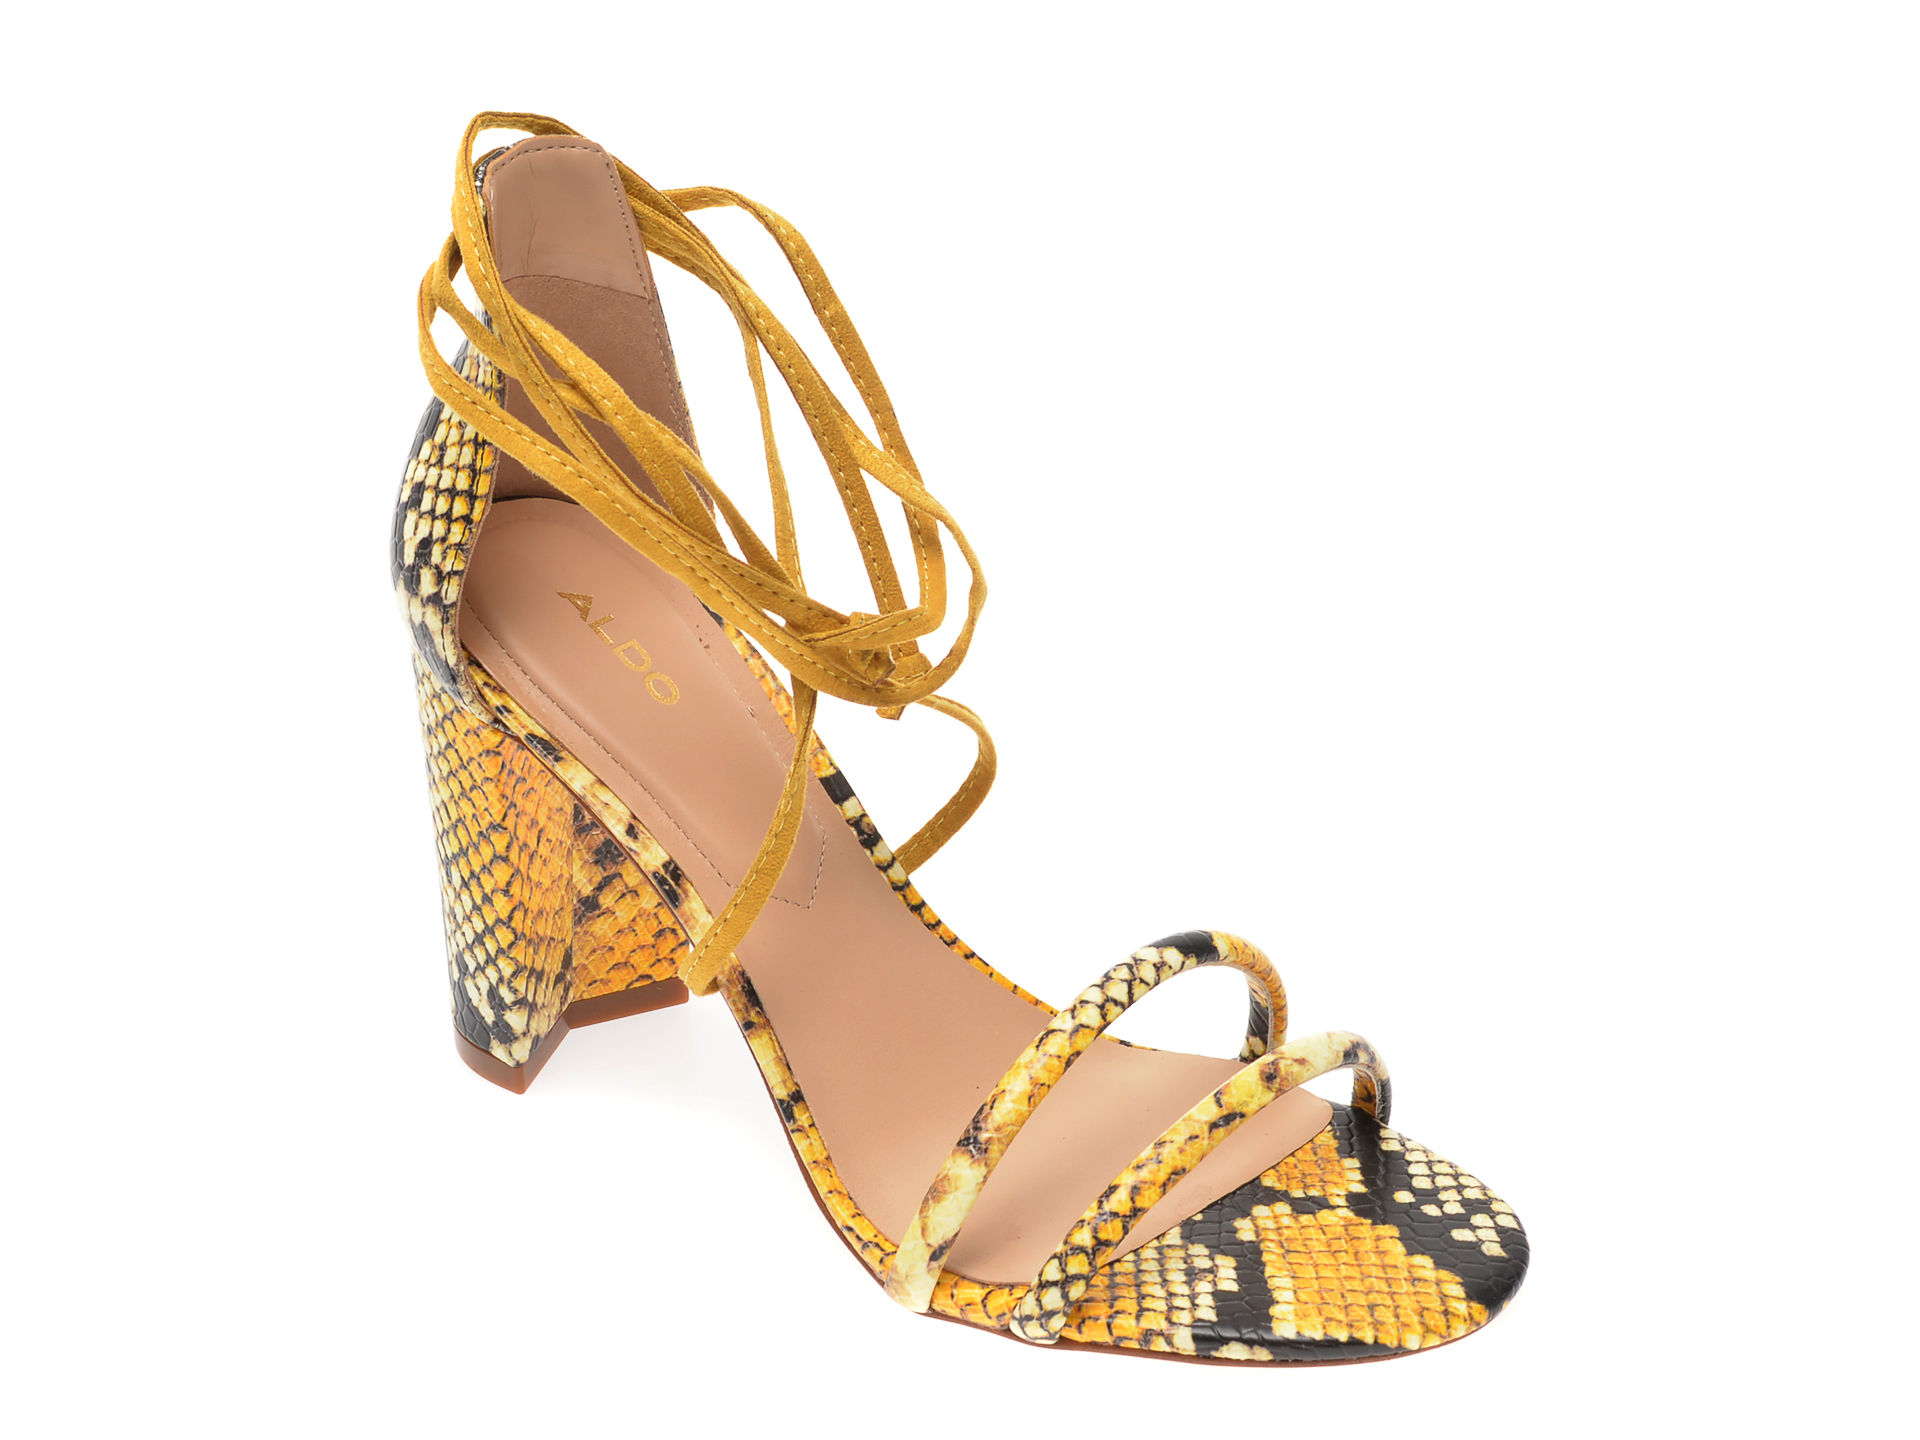 Sandale ALDO galbene, Nyderia750, din piele ecologica